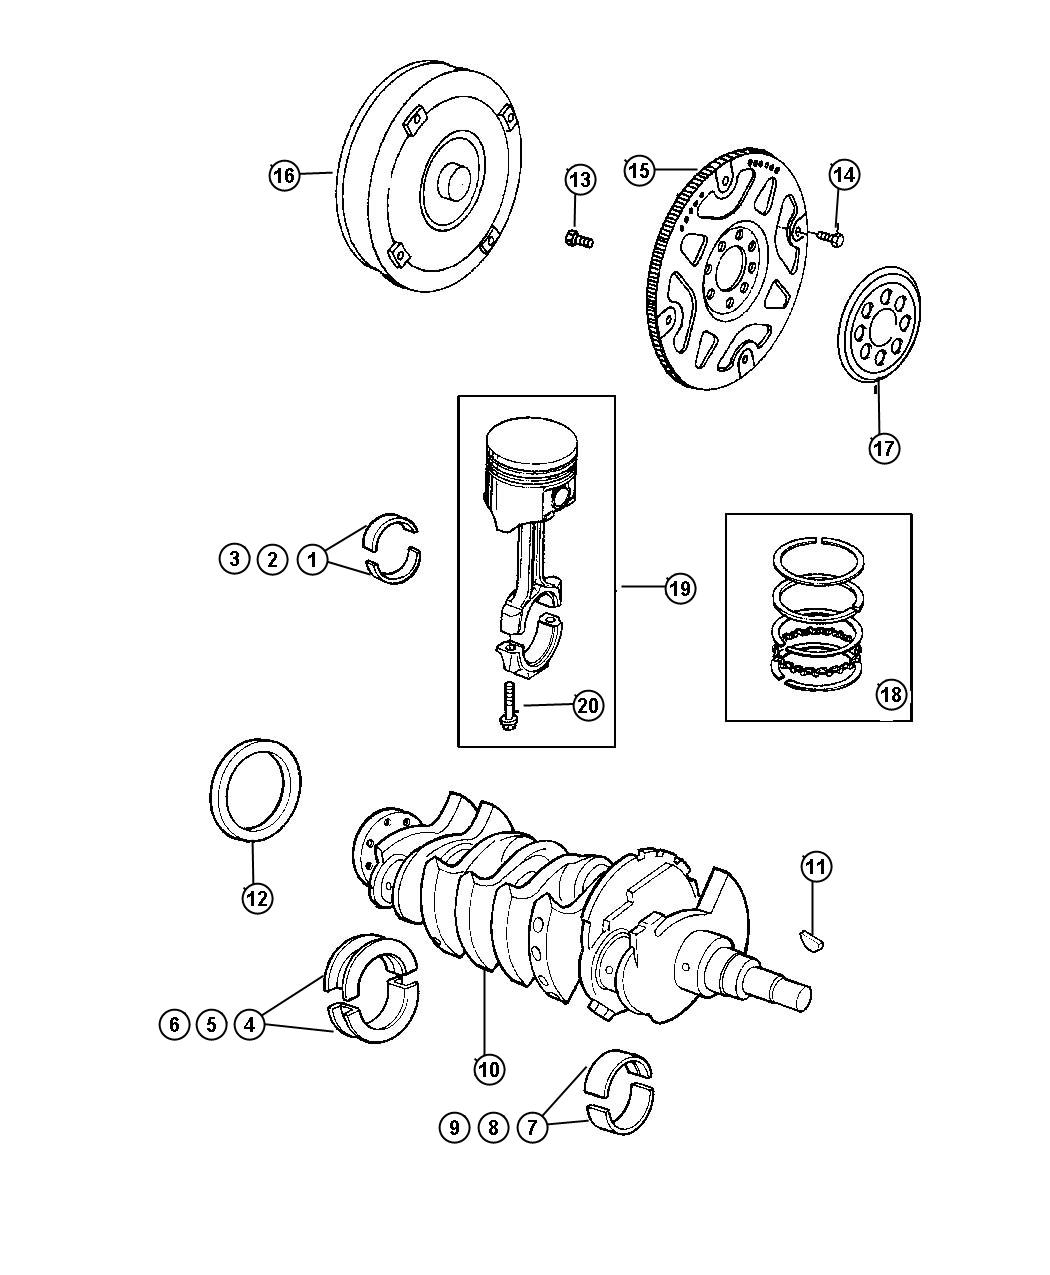 Dodge Caravan Converter, converter kit, converter package